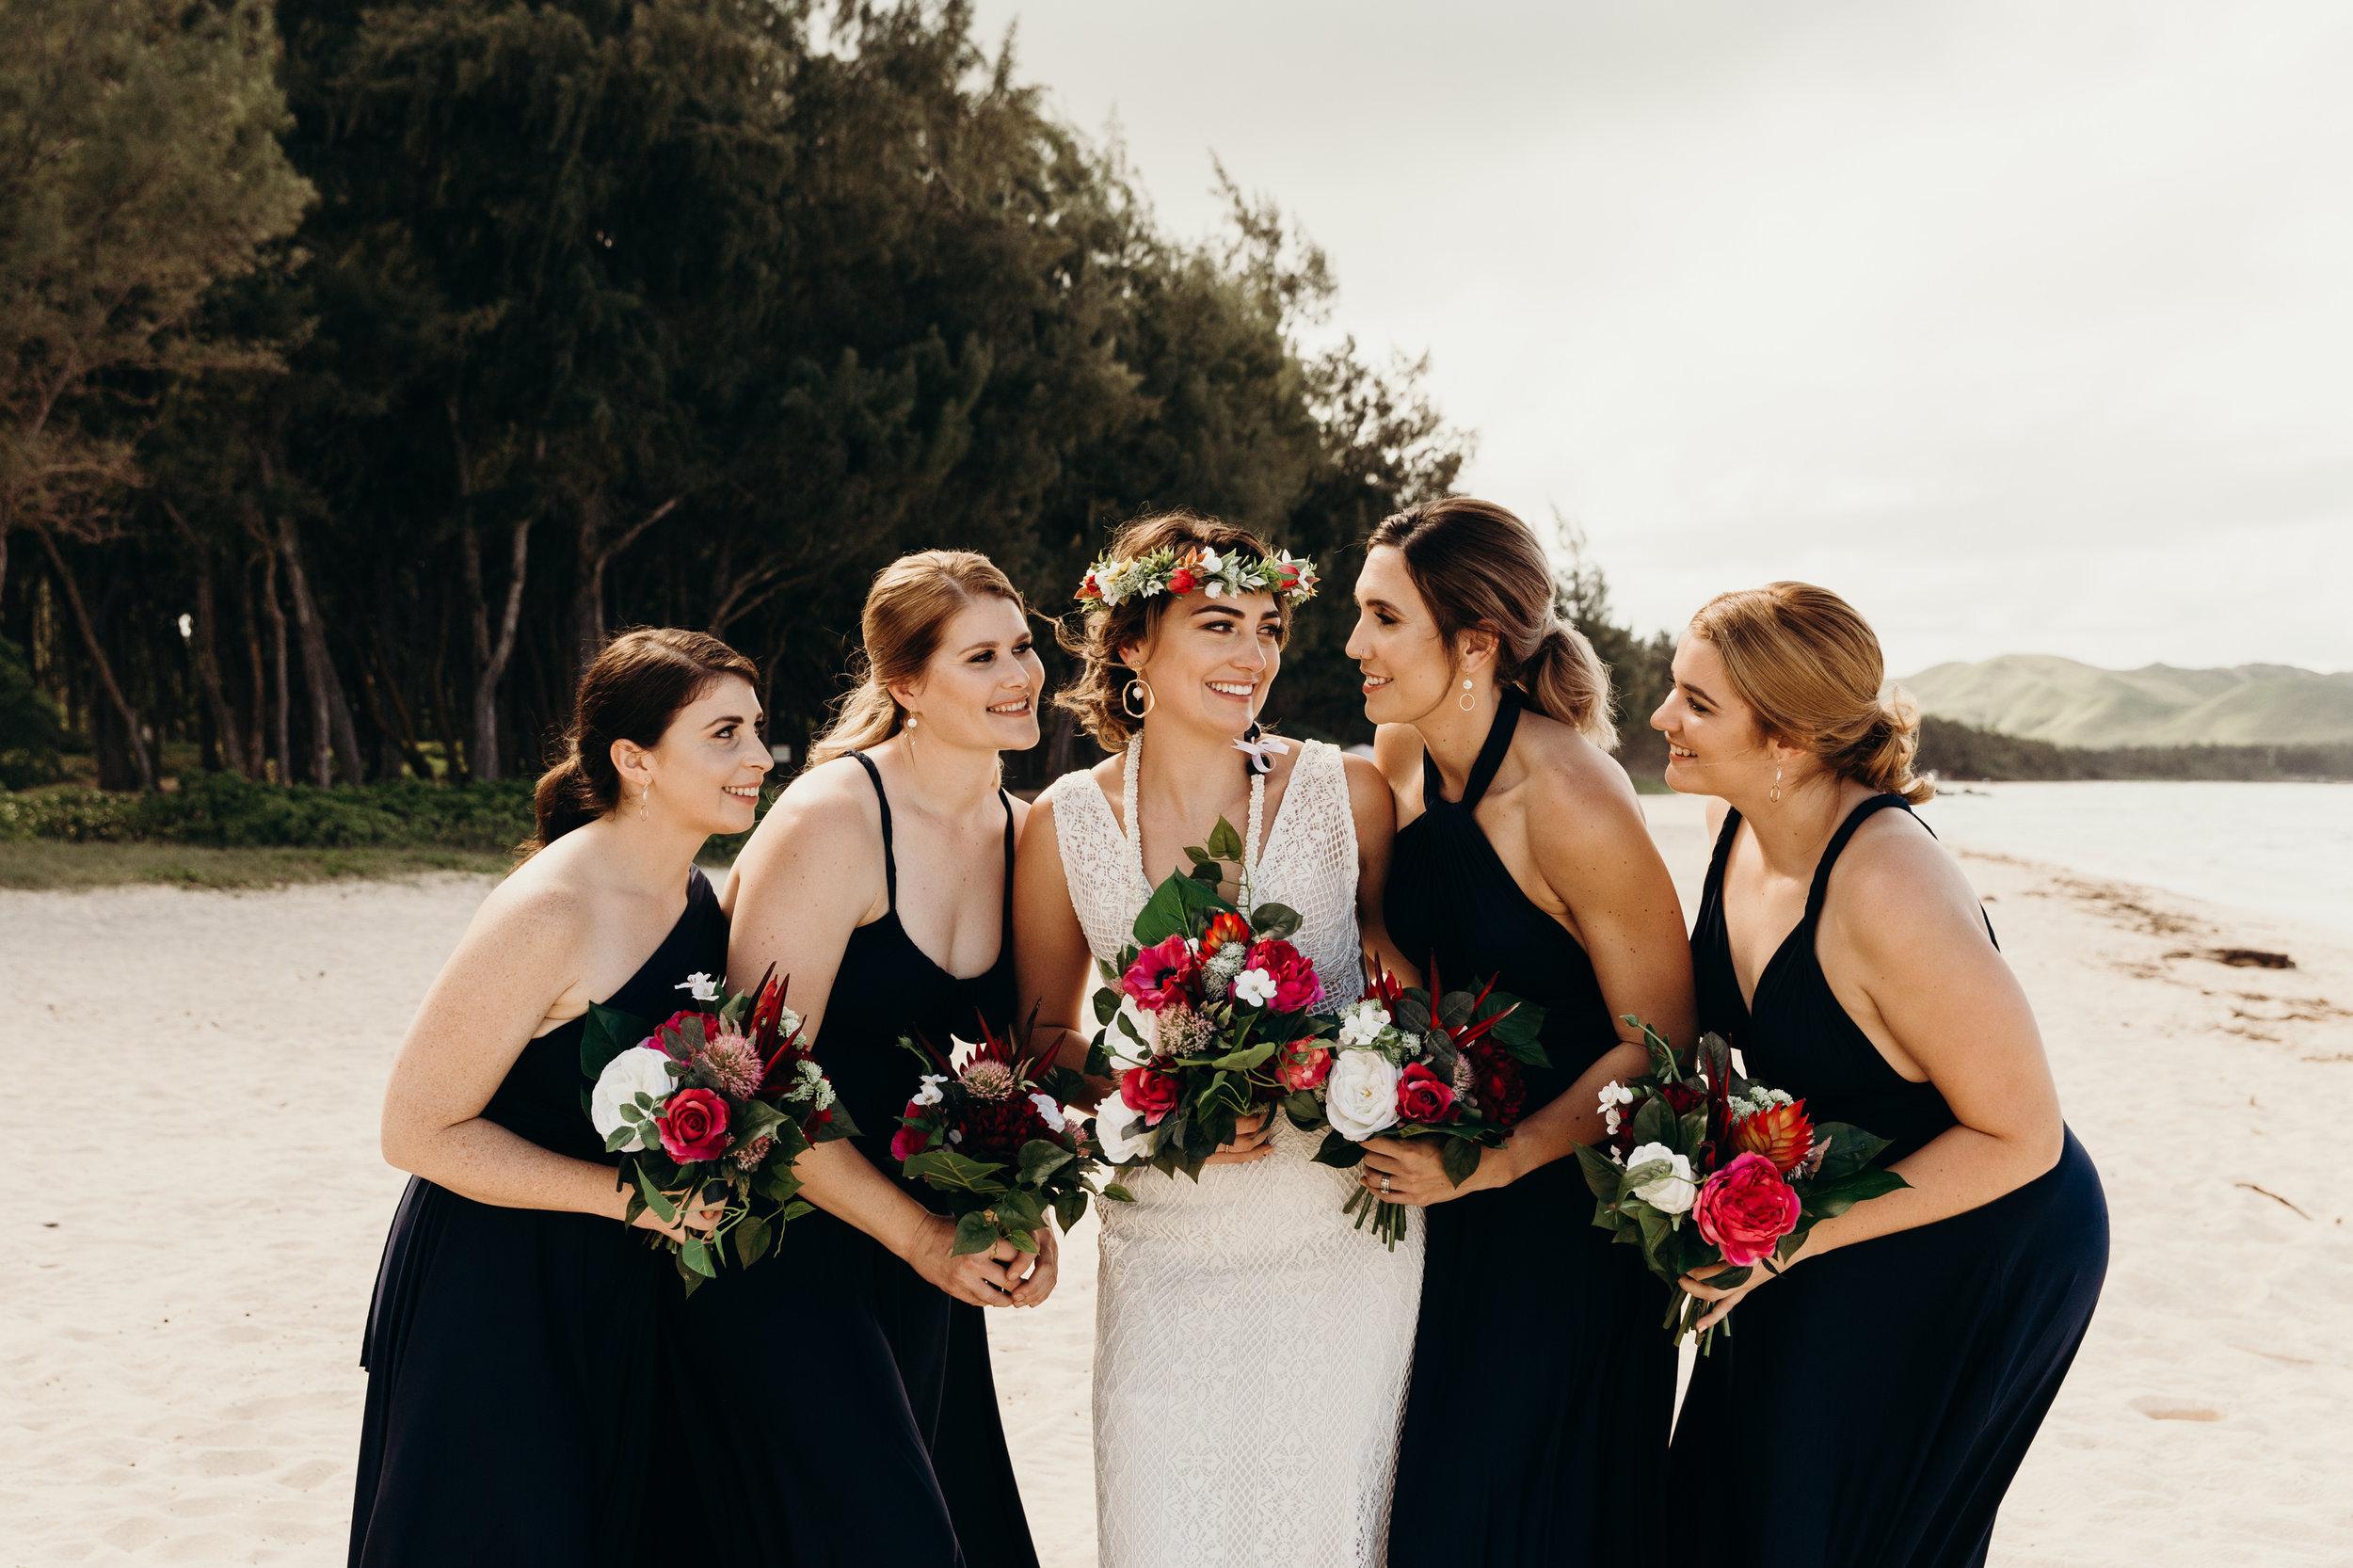 HAWAII-WEDDING-PHOTOGRAPHER-ALOHILANI-RESORT-KEANI-BAKULA-38.jpg